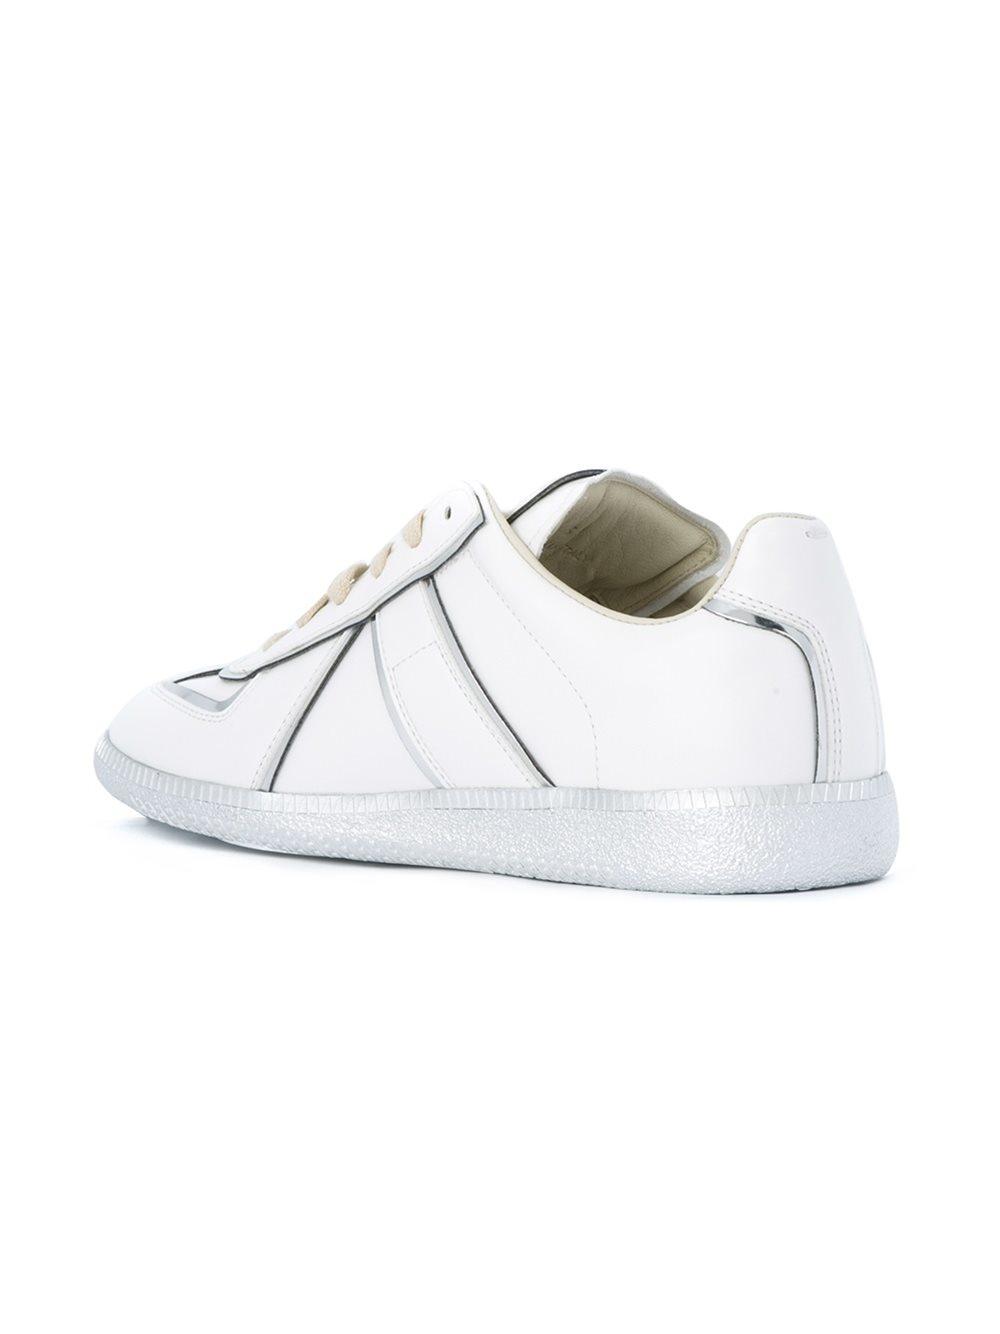 Maison margiela 'replica' Sneakers in White | Lyst